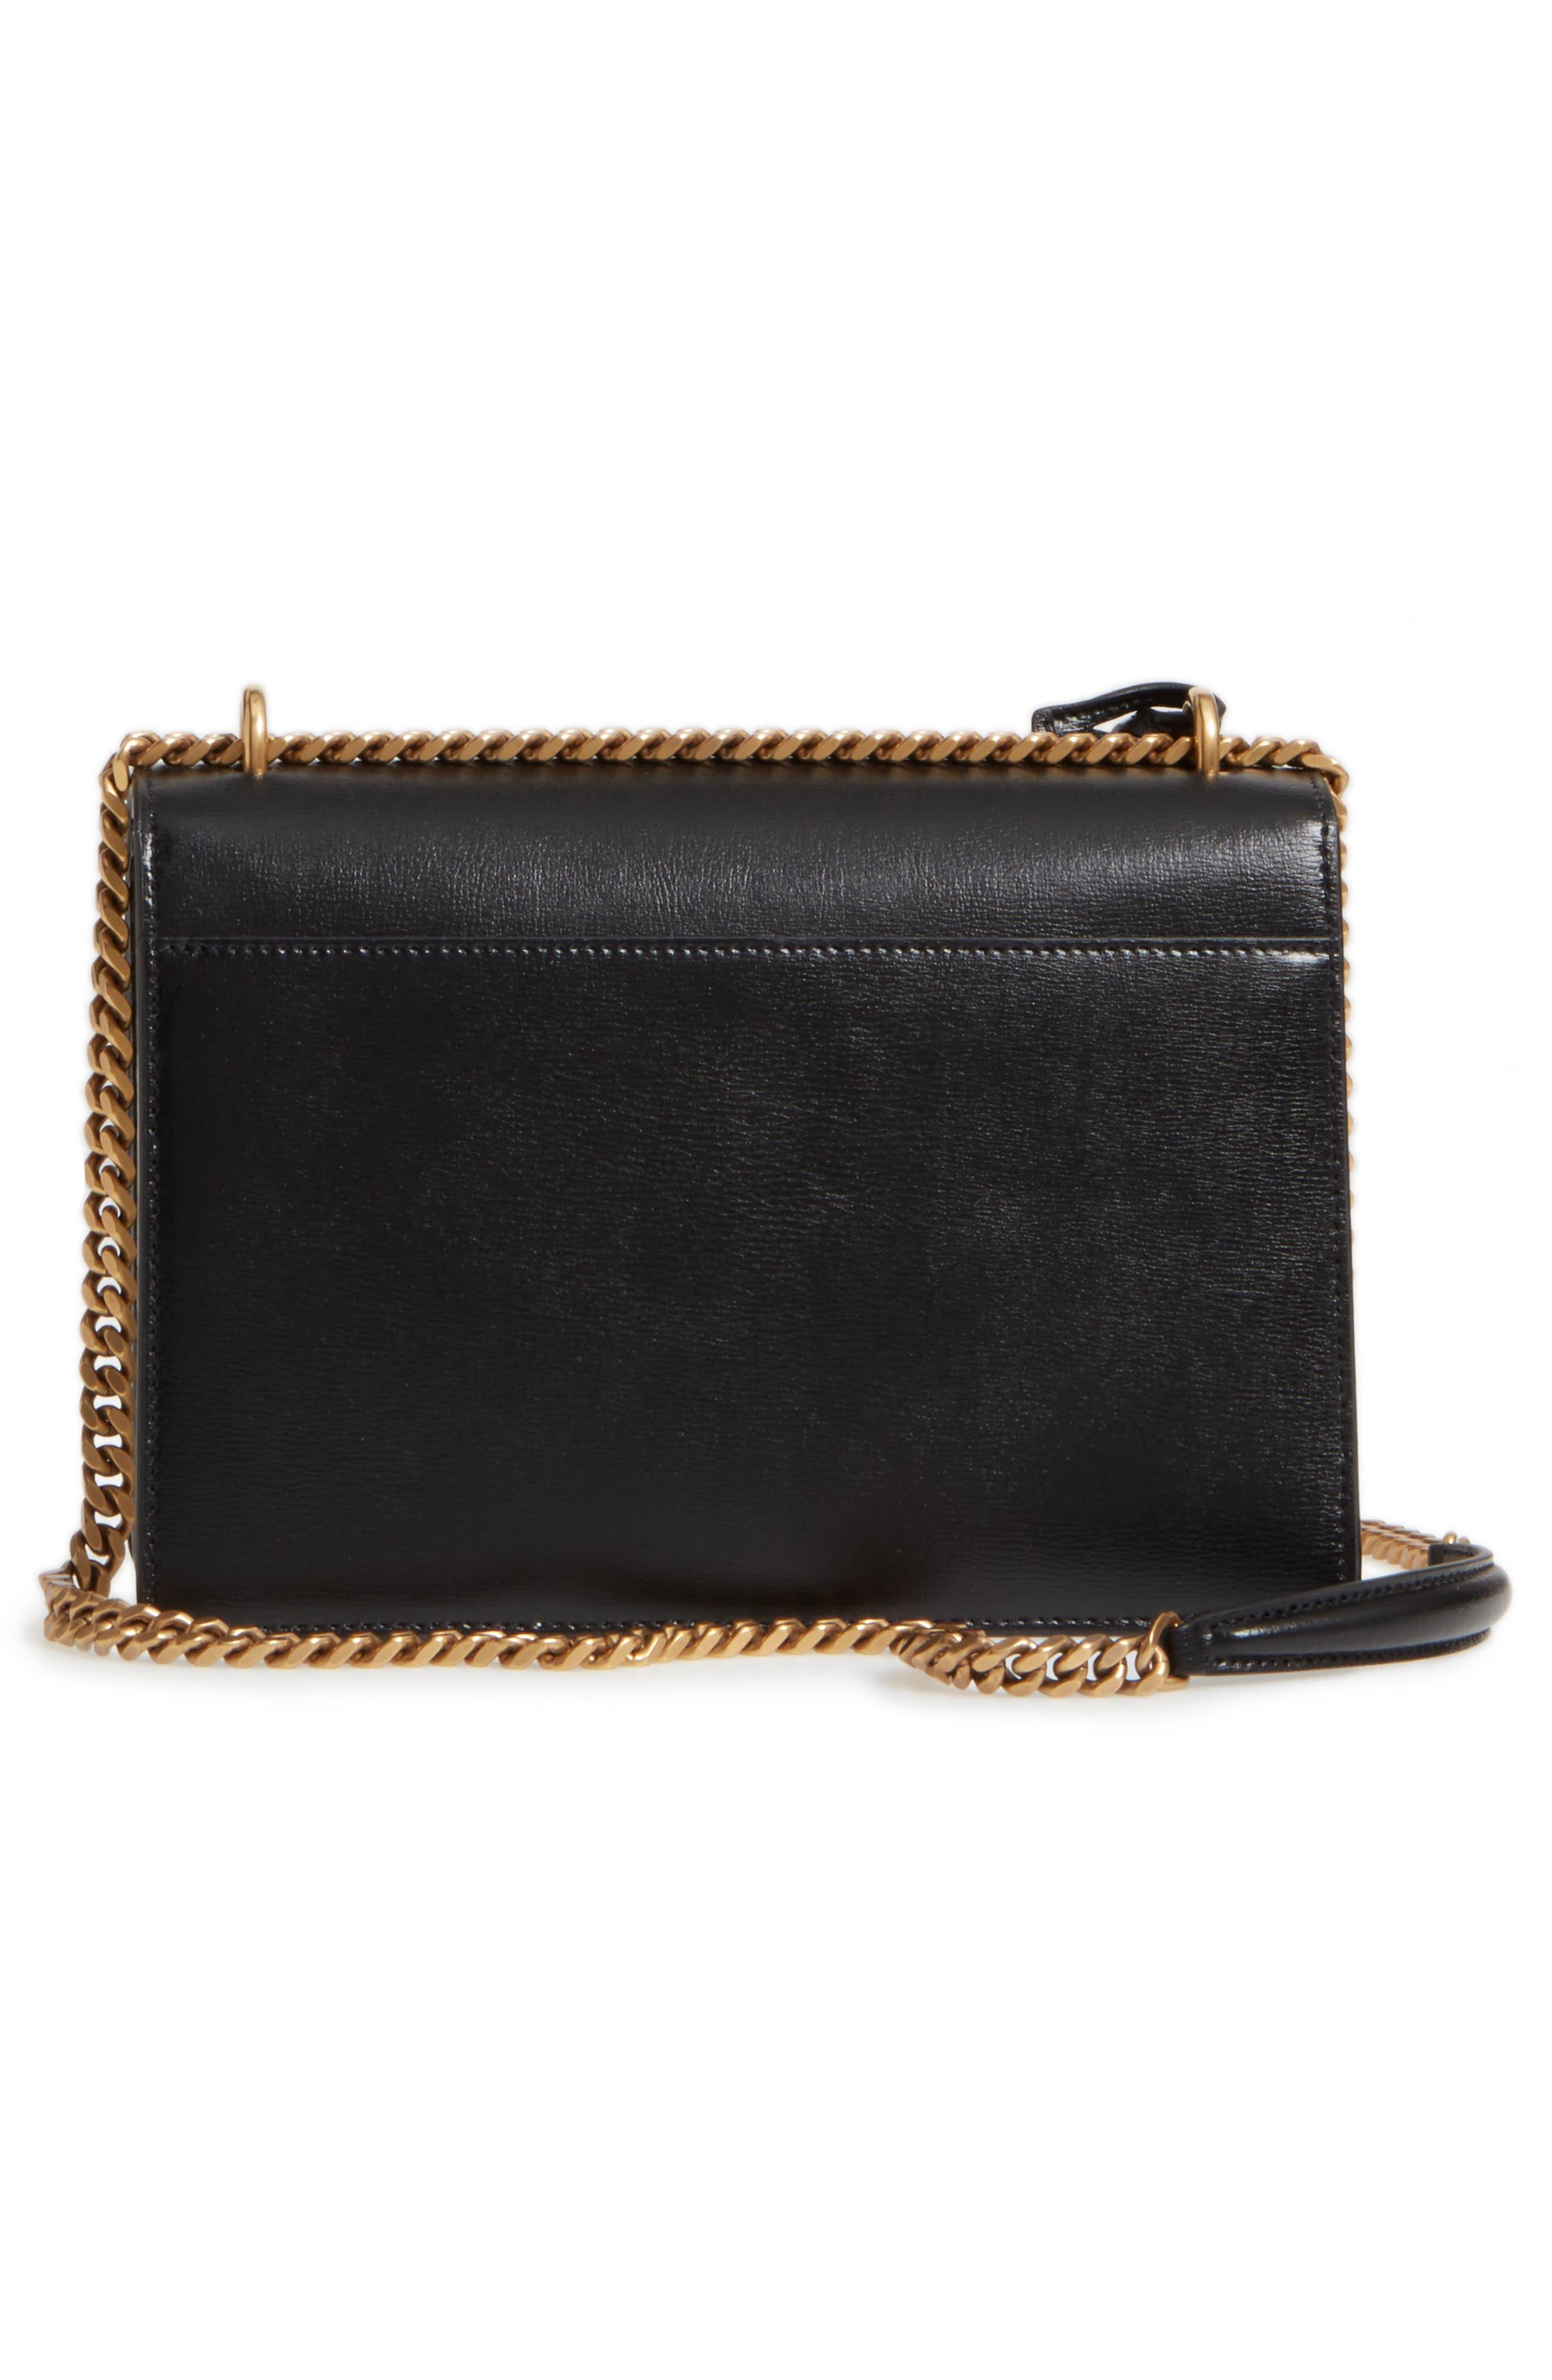 Medium Sunset Leather Shoulder Bag,                             Alternate thumbnail 3, color,                             Black/ White